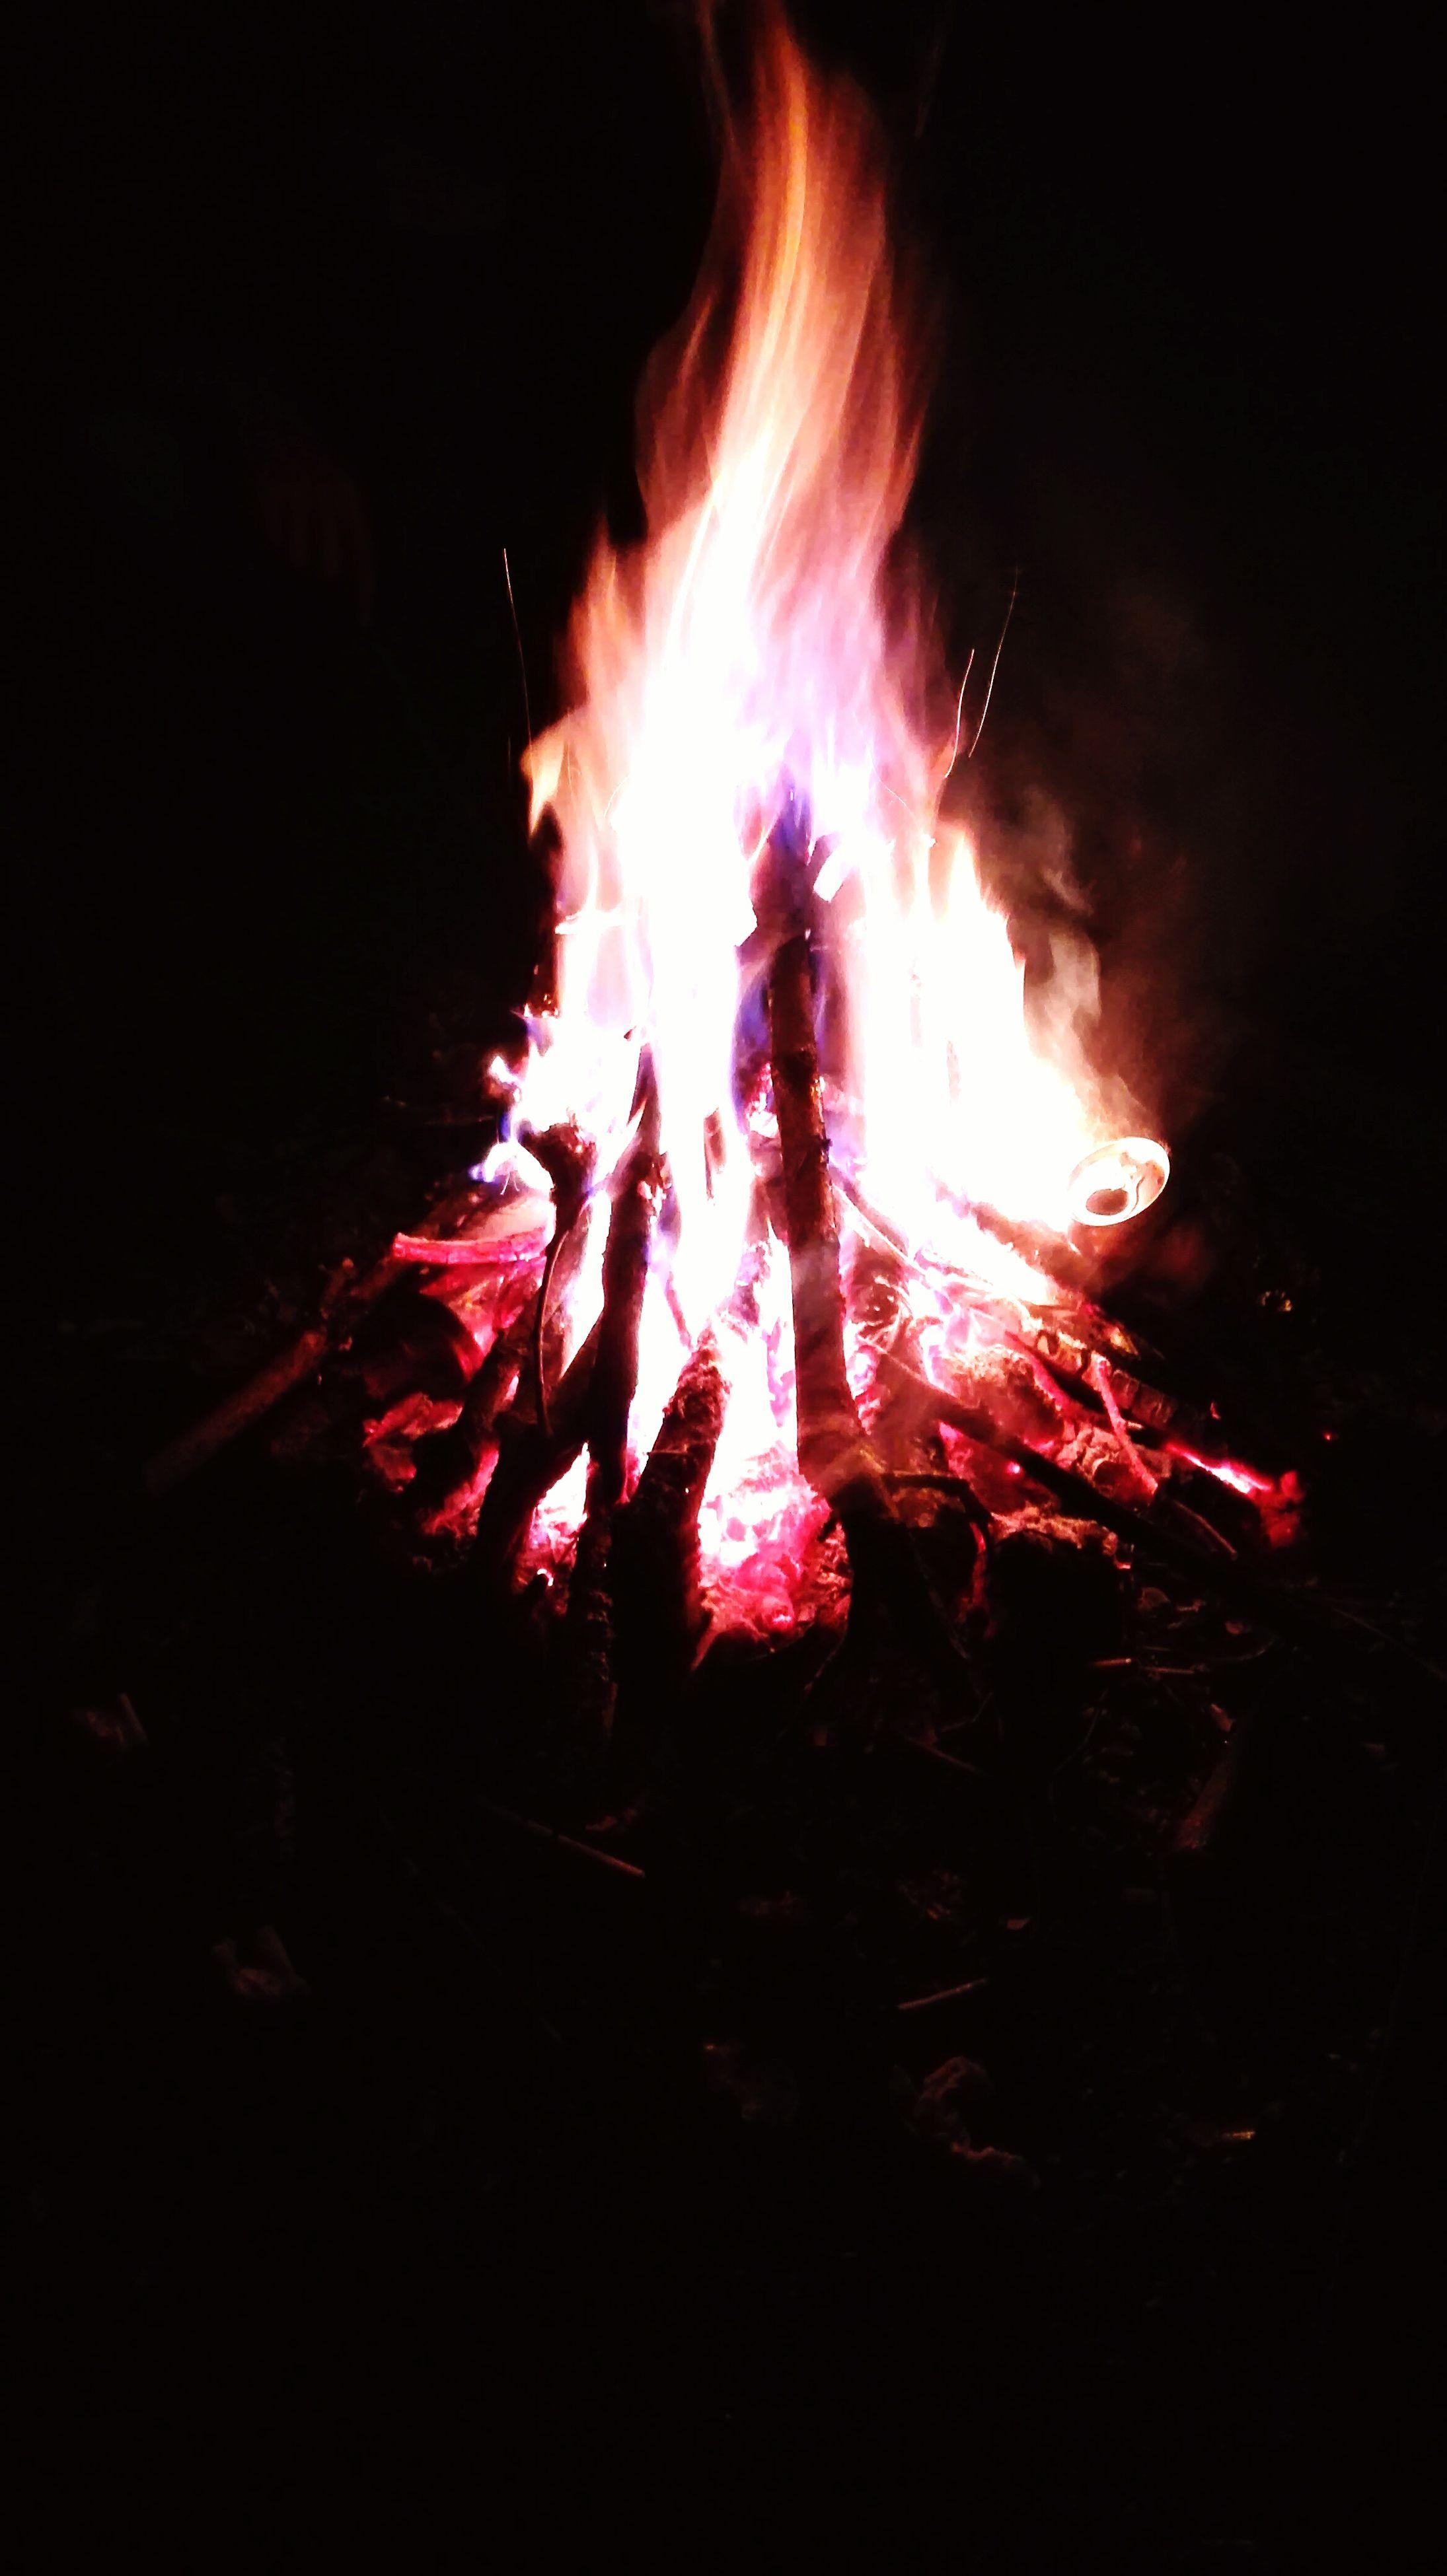 fire - natural phenomenon, burning, night, flame, heat - temperature, glowing, bonfire, fire, motion, illuminated, long exposure, dark, campfire, heat, light - natural phenomenon, firewood, outdoors, sparks, orange color, close-up